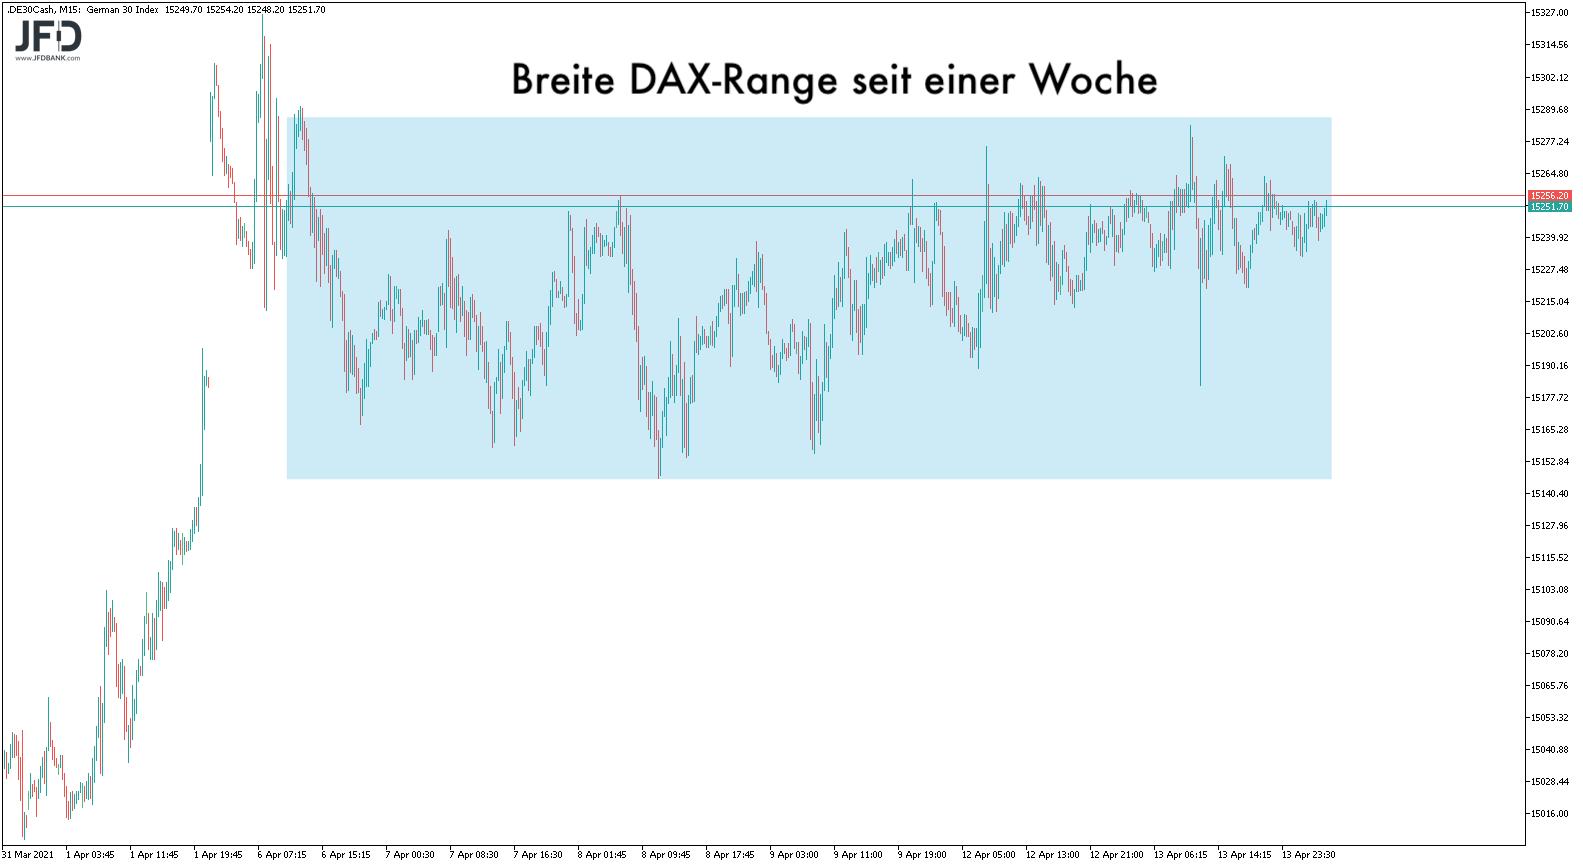 Gefangen-in-der-DAX-Range-Kommentar-JFD-Bank-GodmodeTrader.de-5